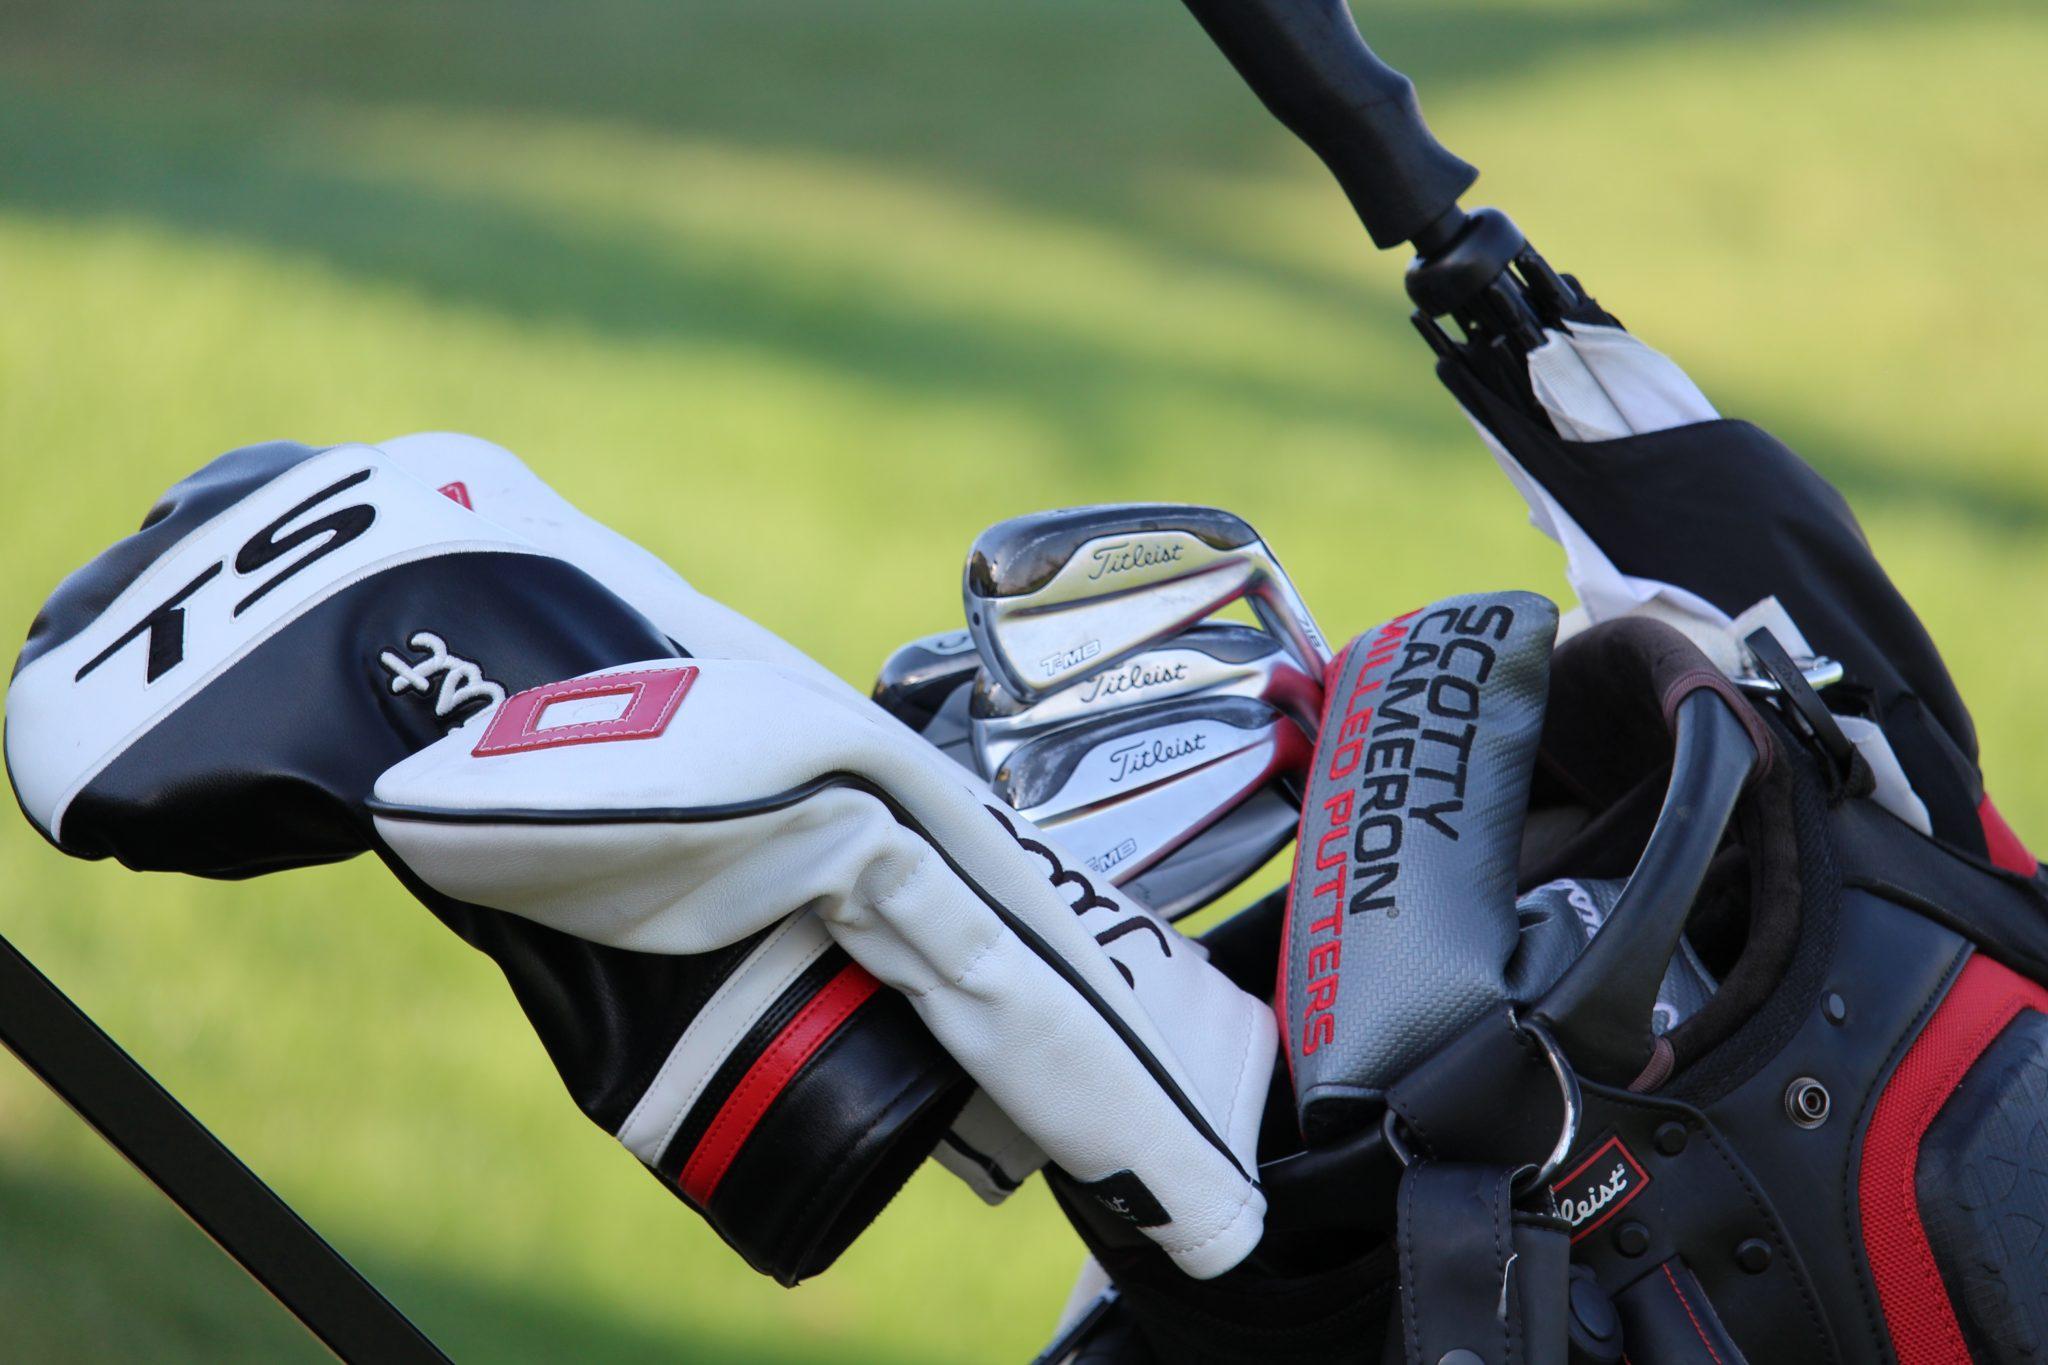 A golf bag with golf clubs